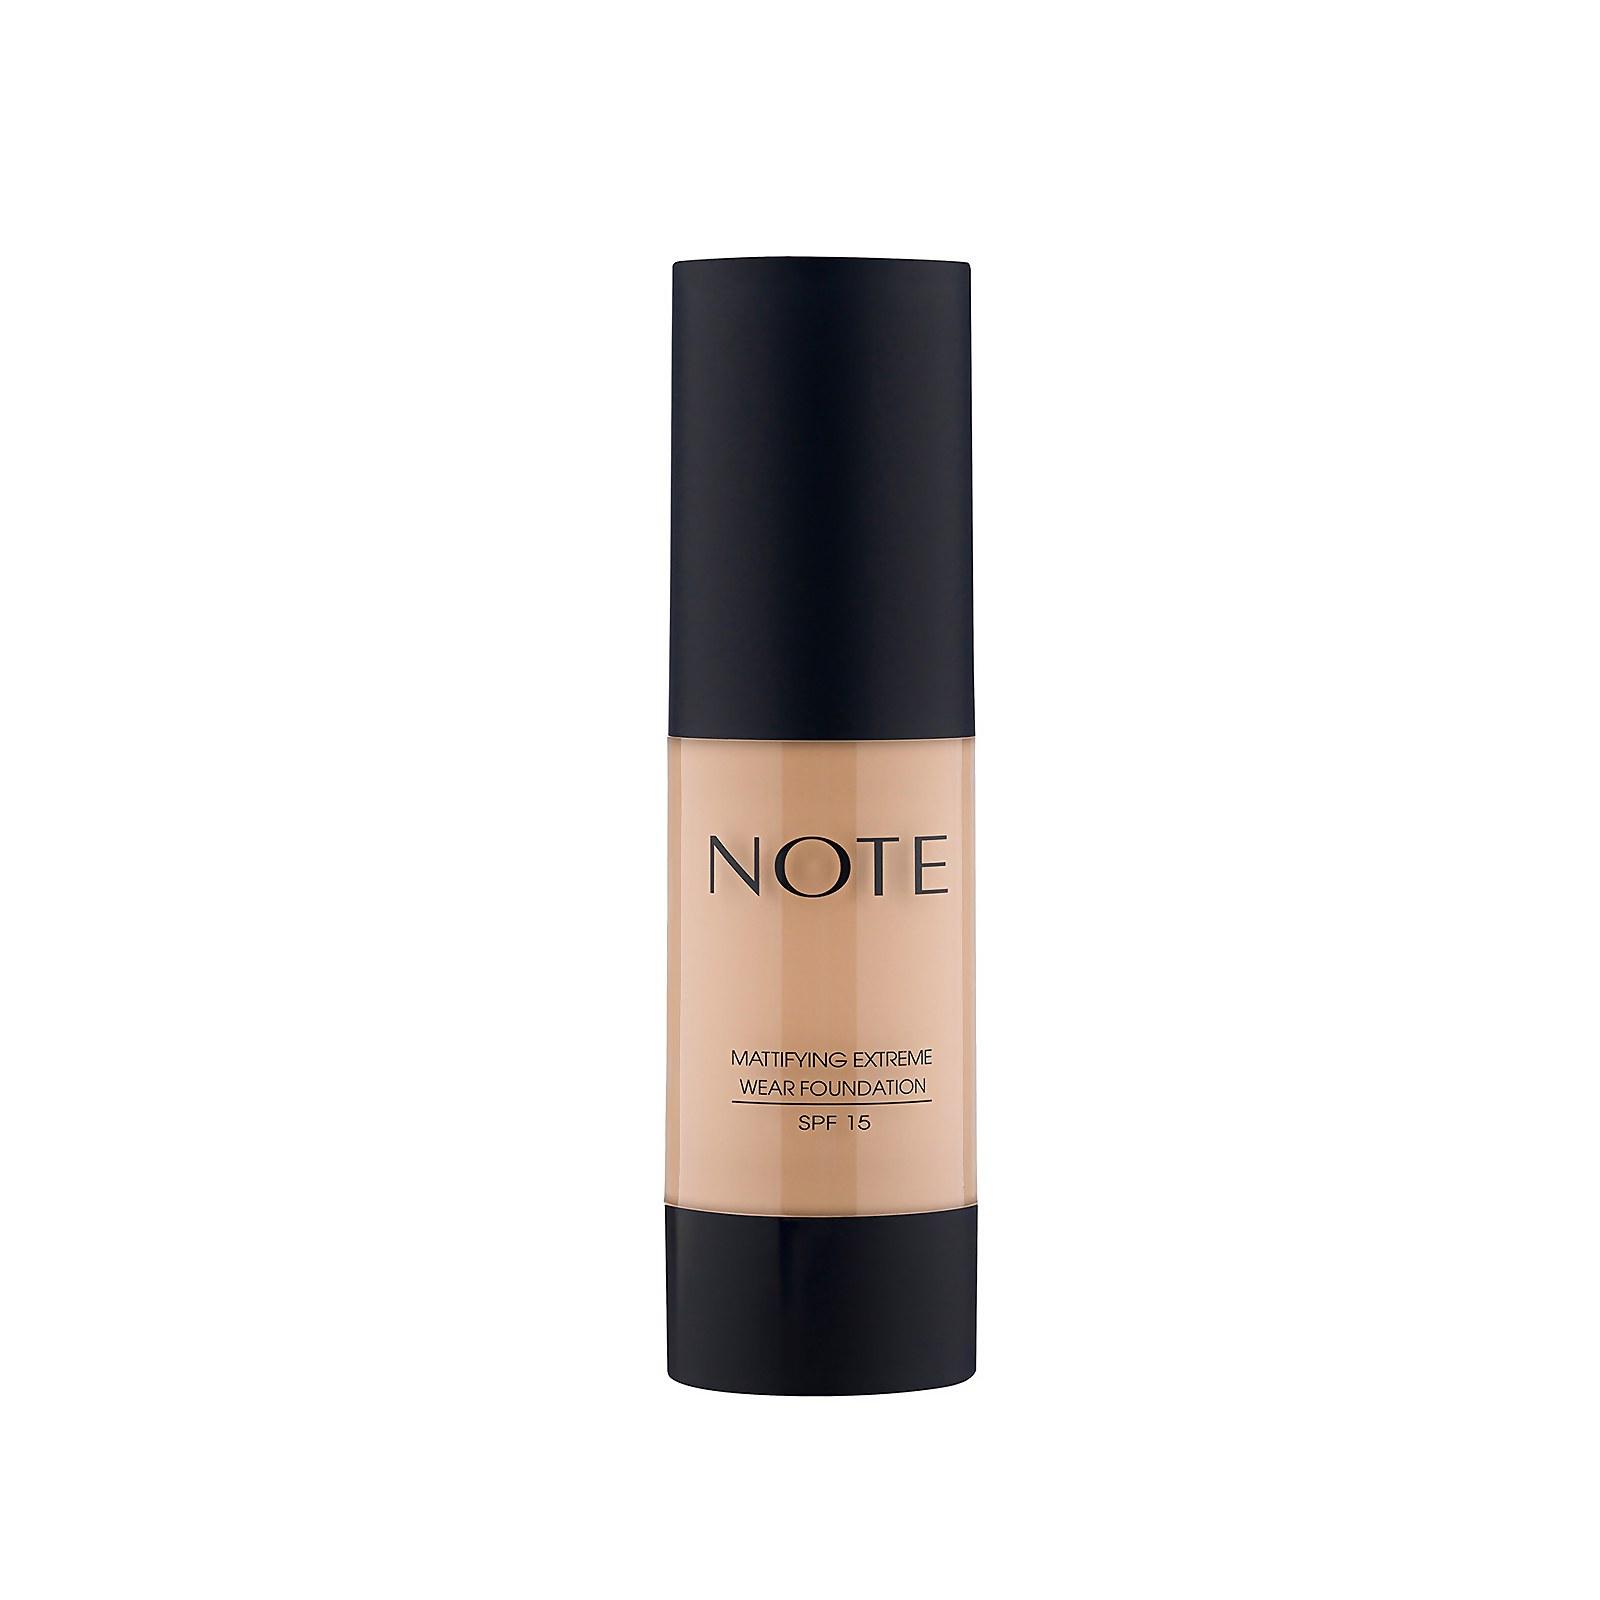 Купить Note Cosmetics Mattifying Extreme Wear Foundation 35ml (Various Shades) - 121 Porcelain